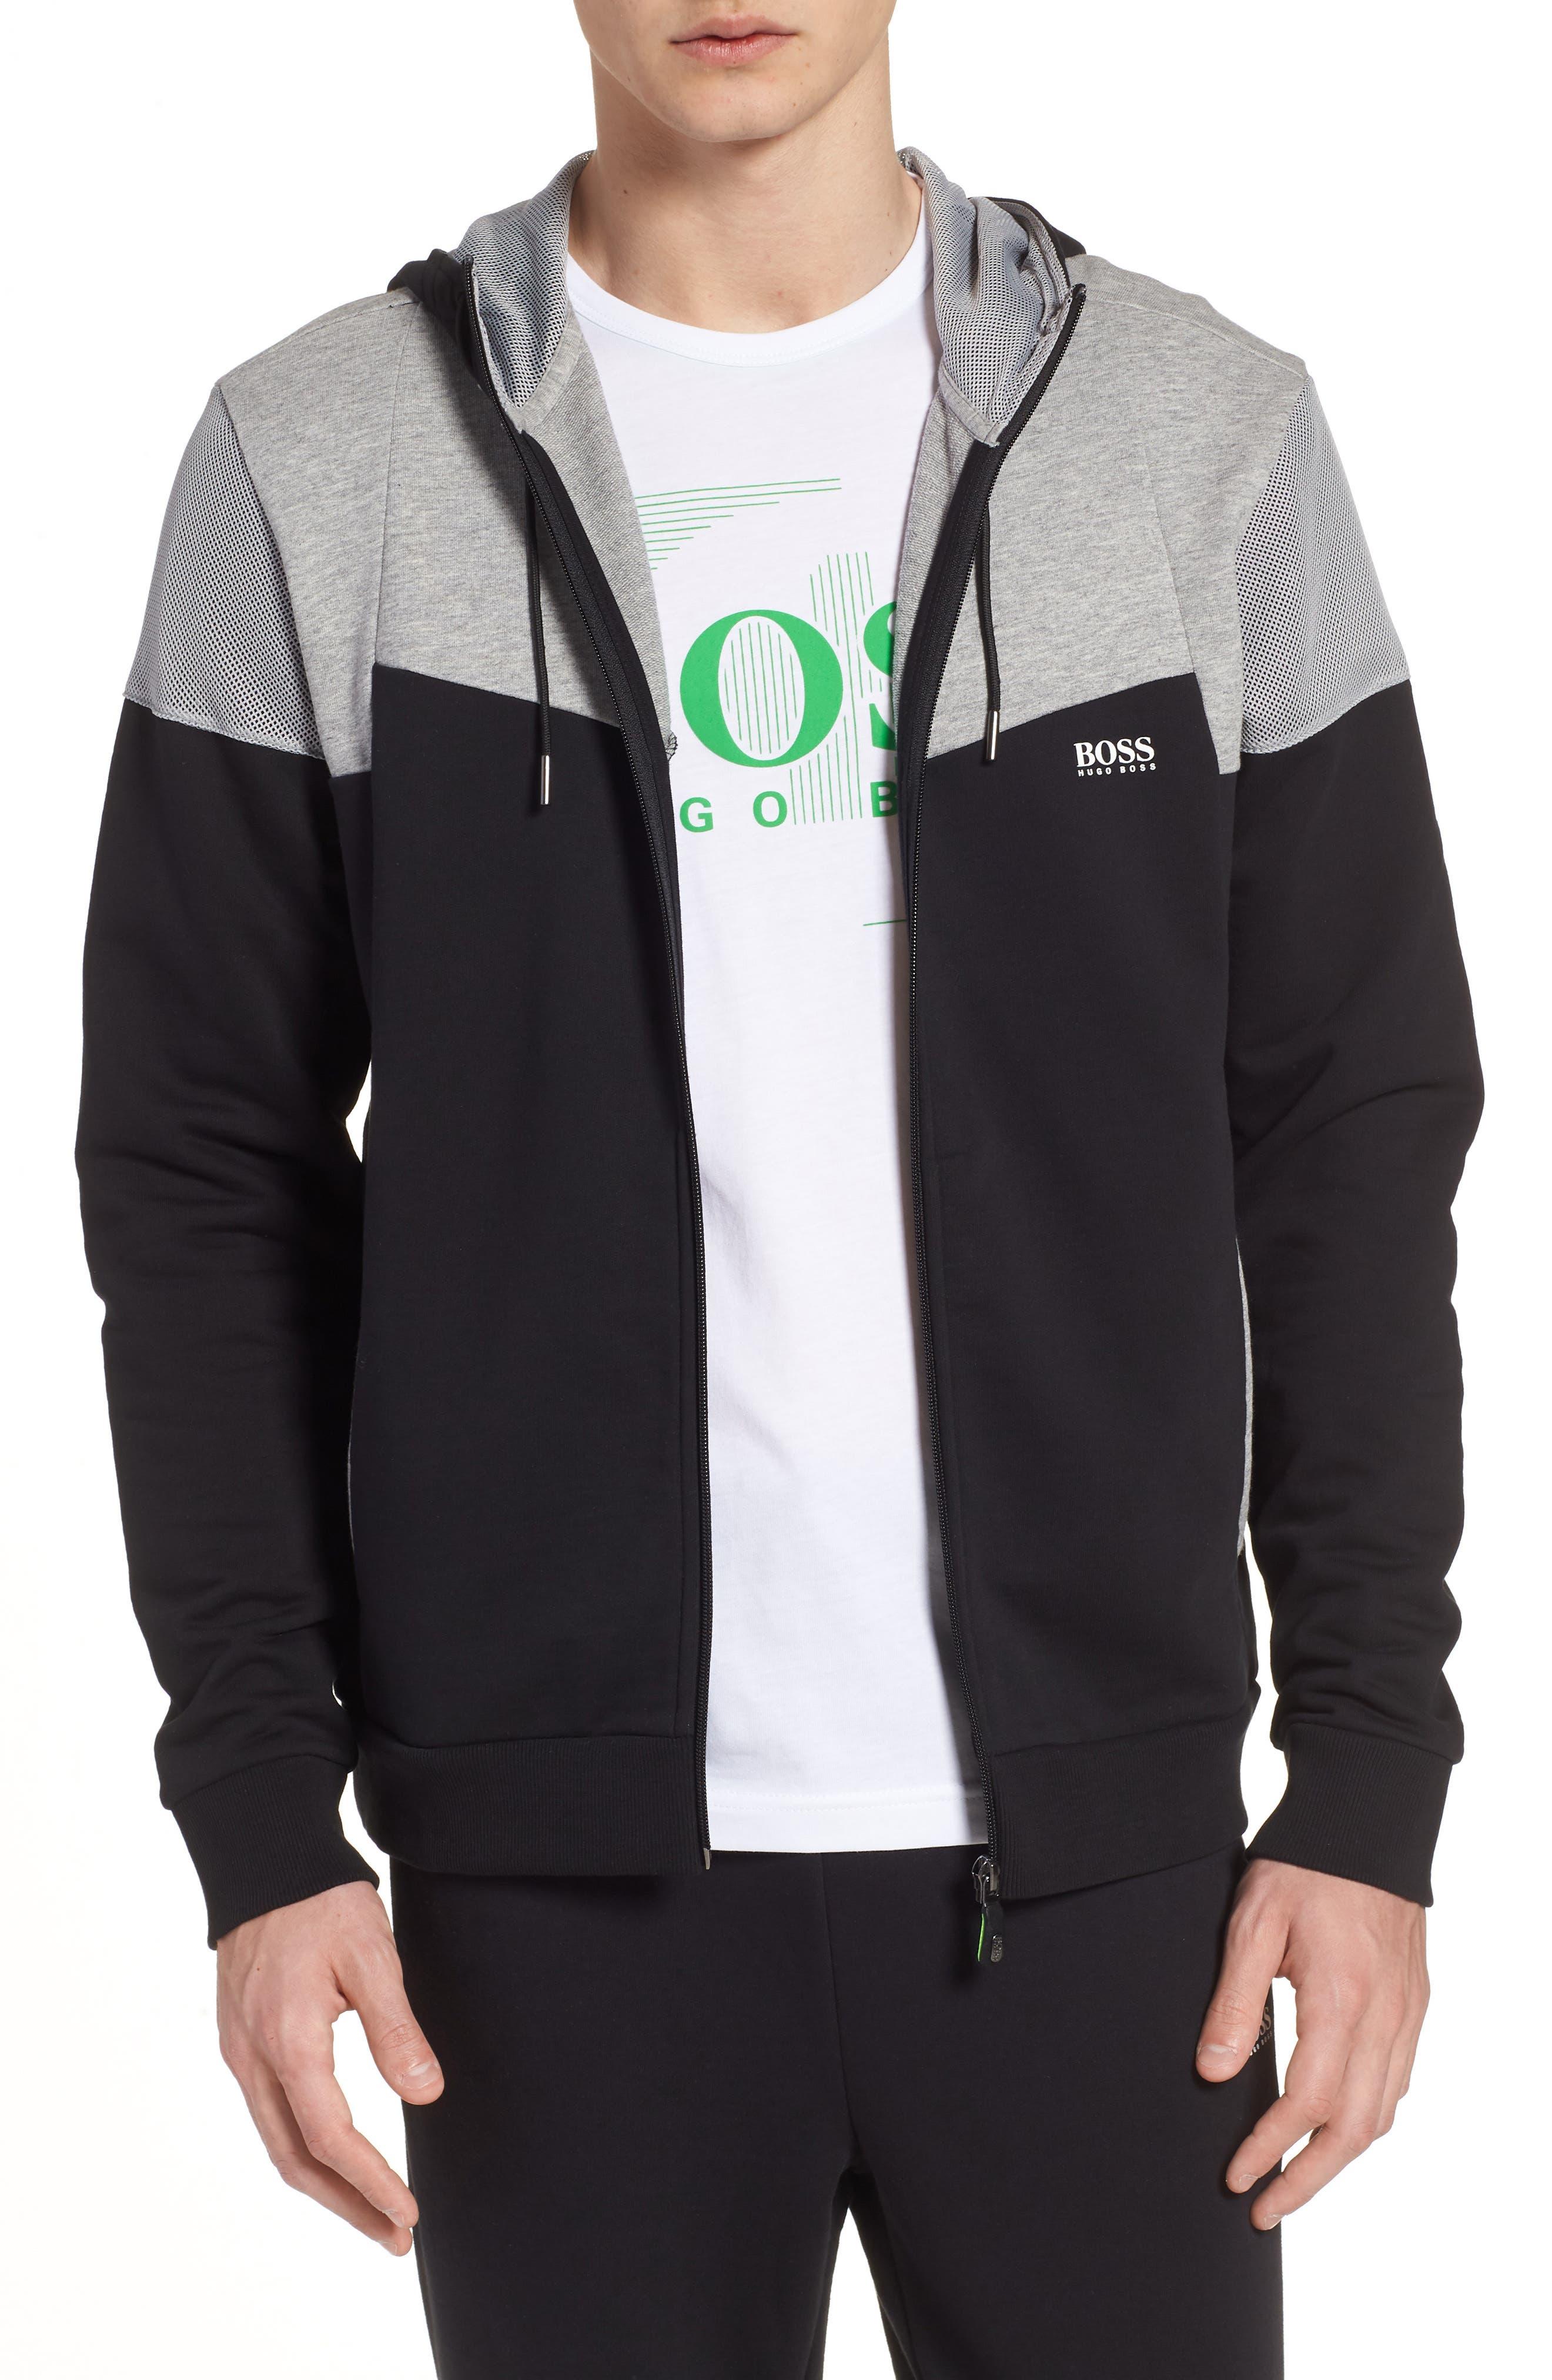 BOSS Regular Fit Hooded Fleece Jacket